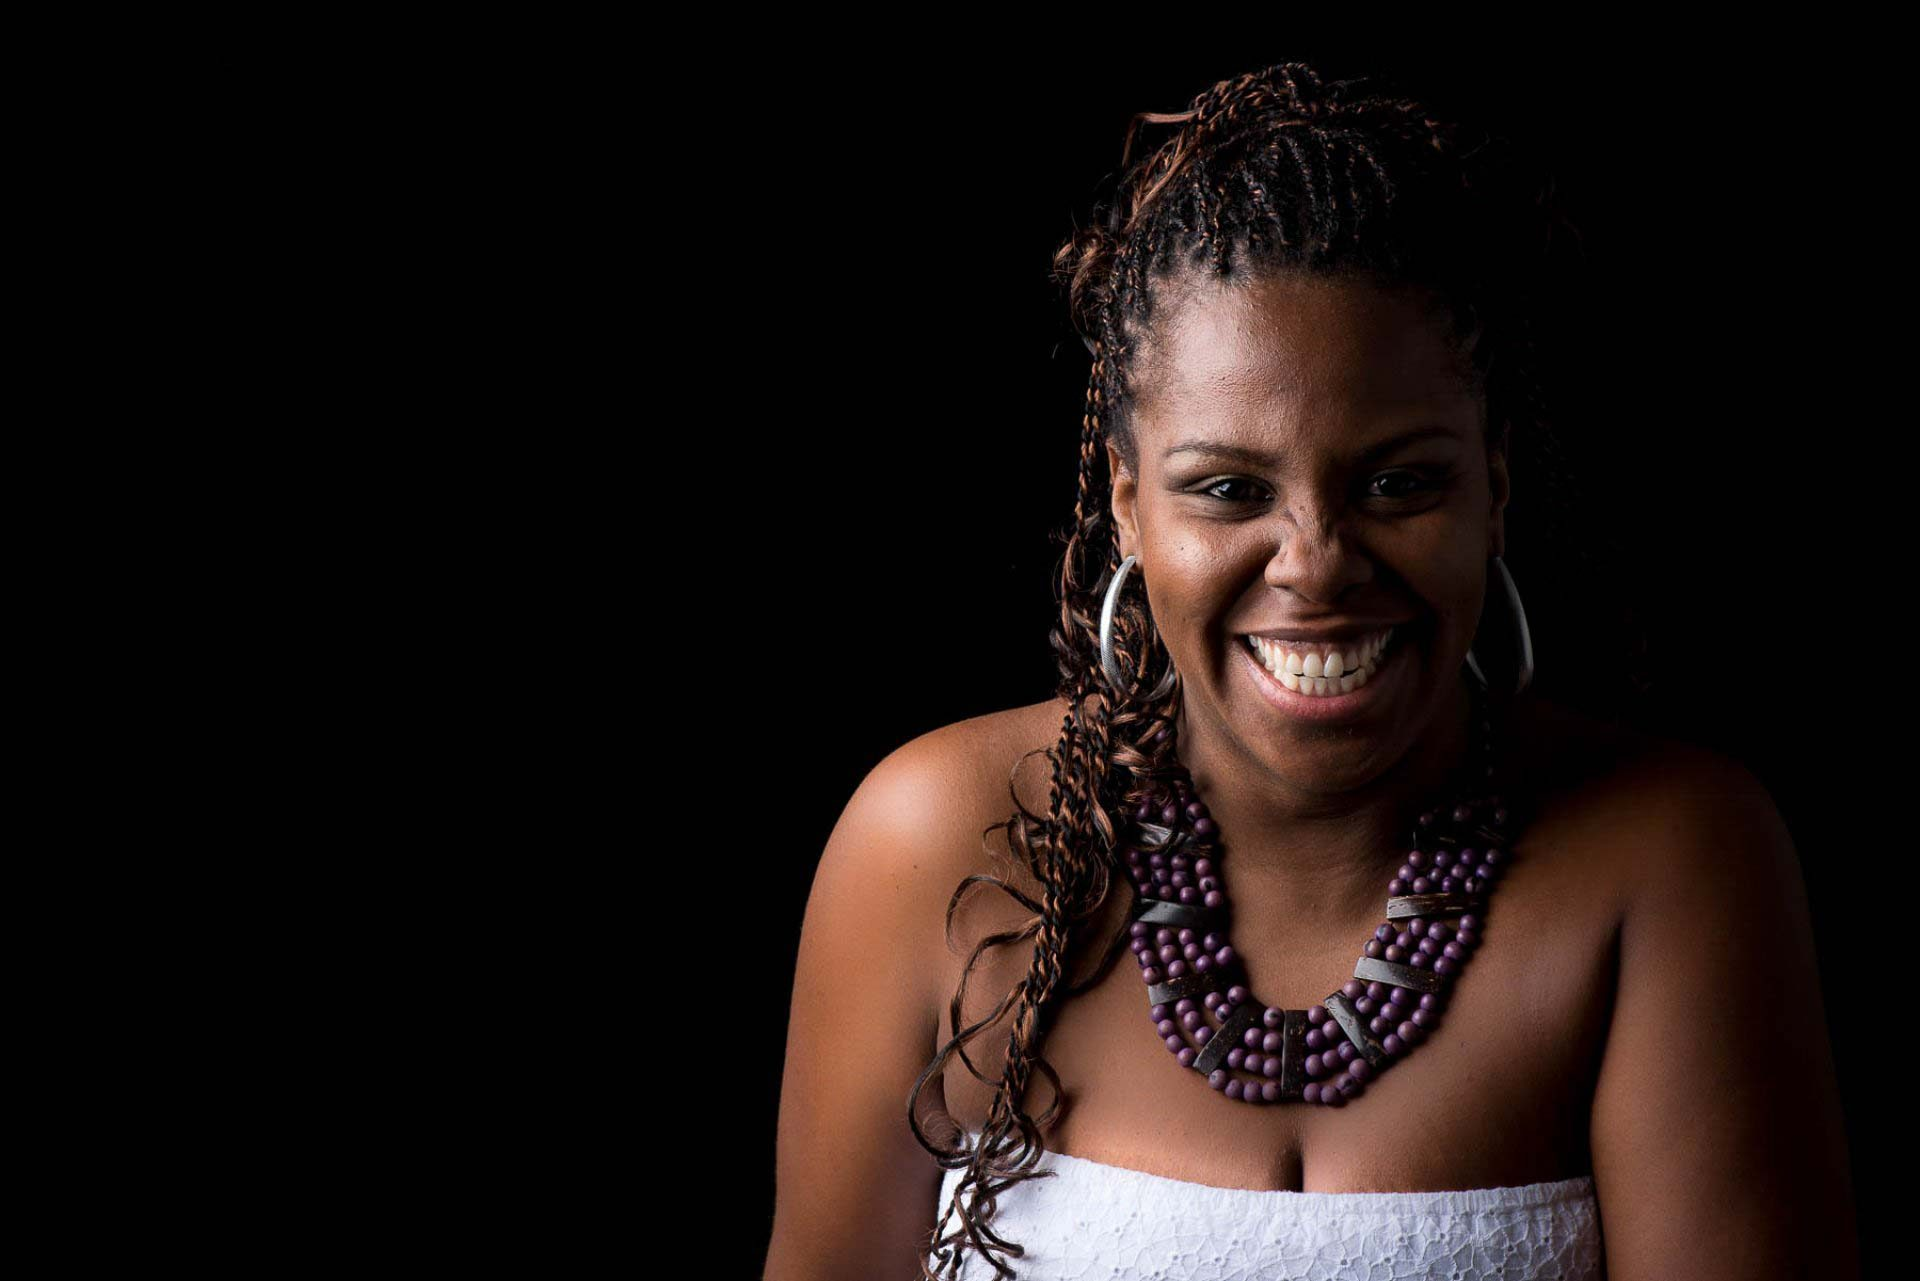 Cantora Mariza Black